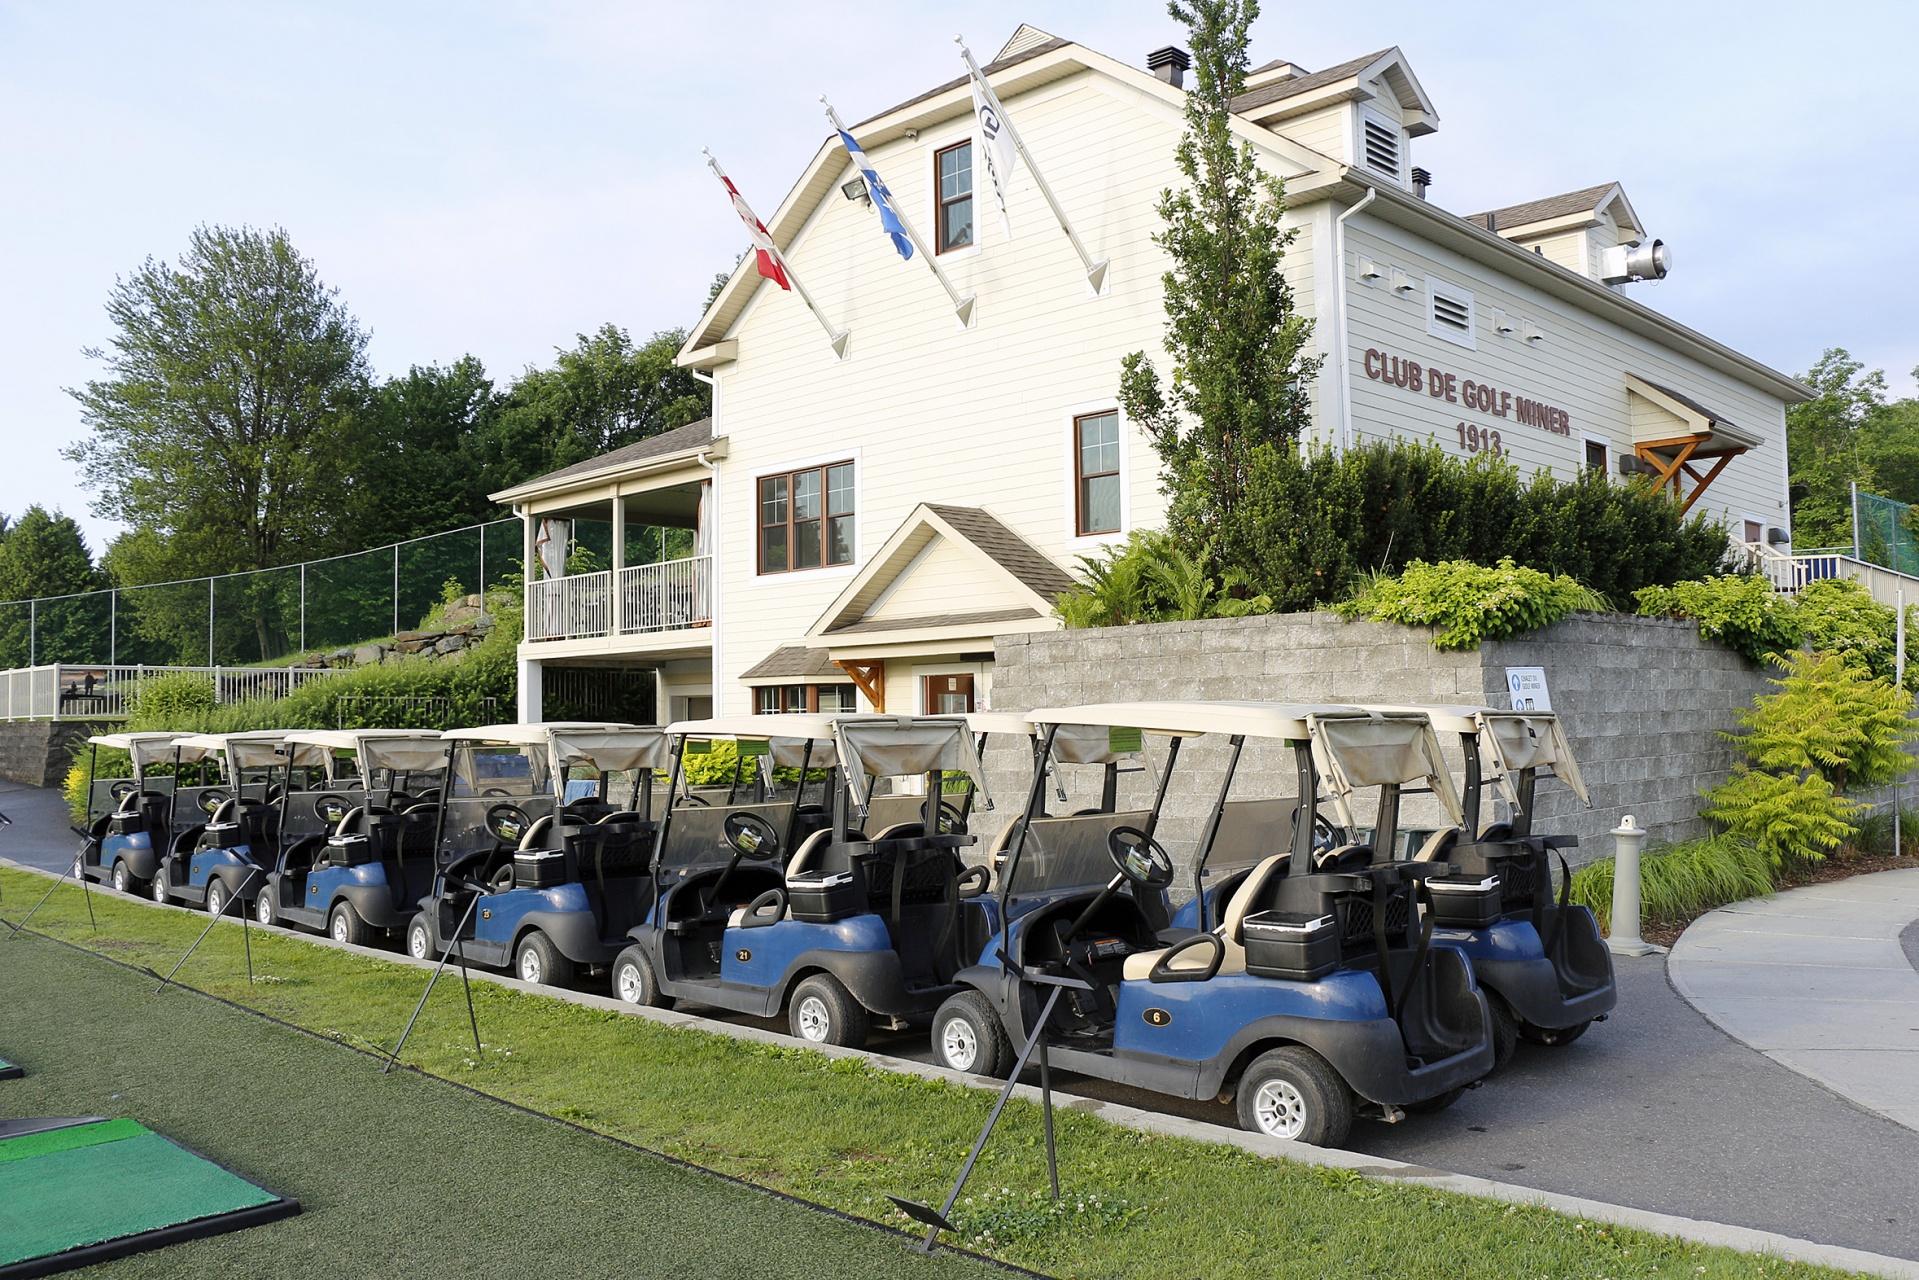 Club de Golf Miner - Album photos